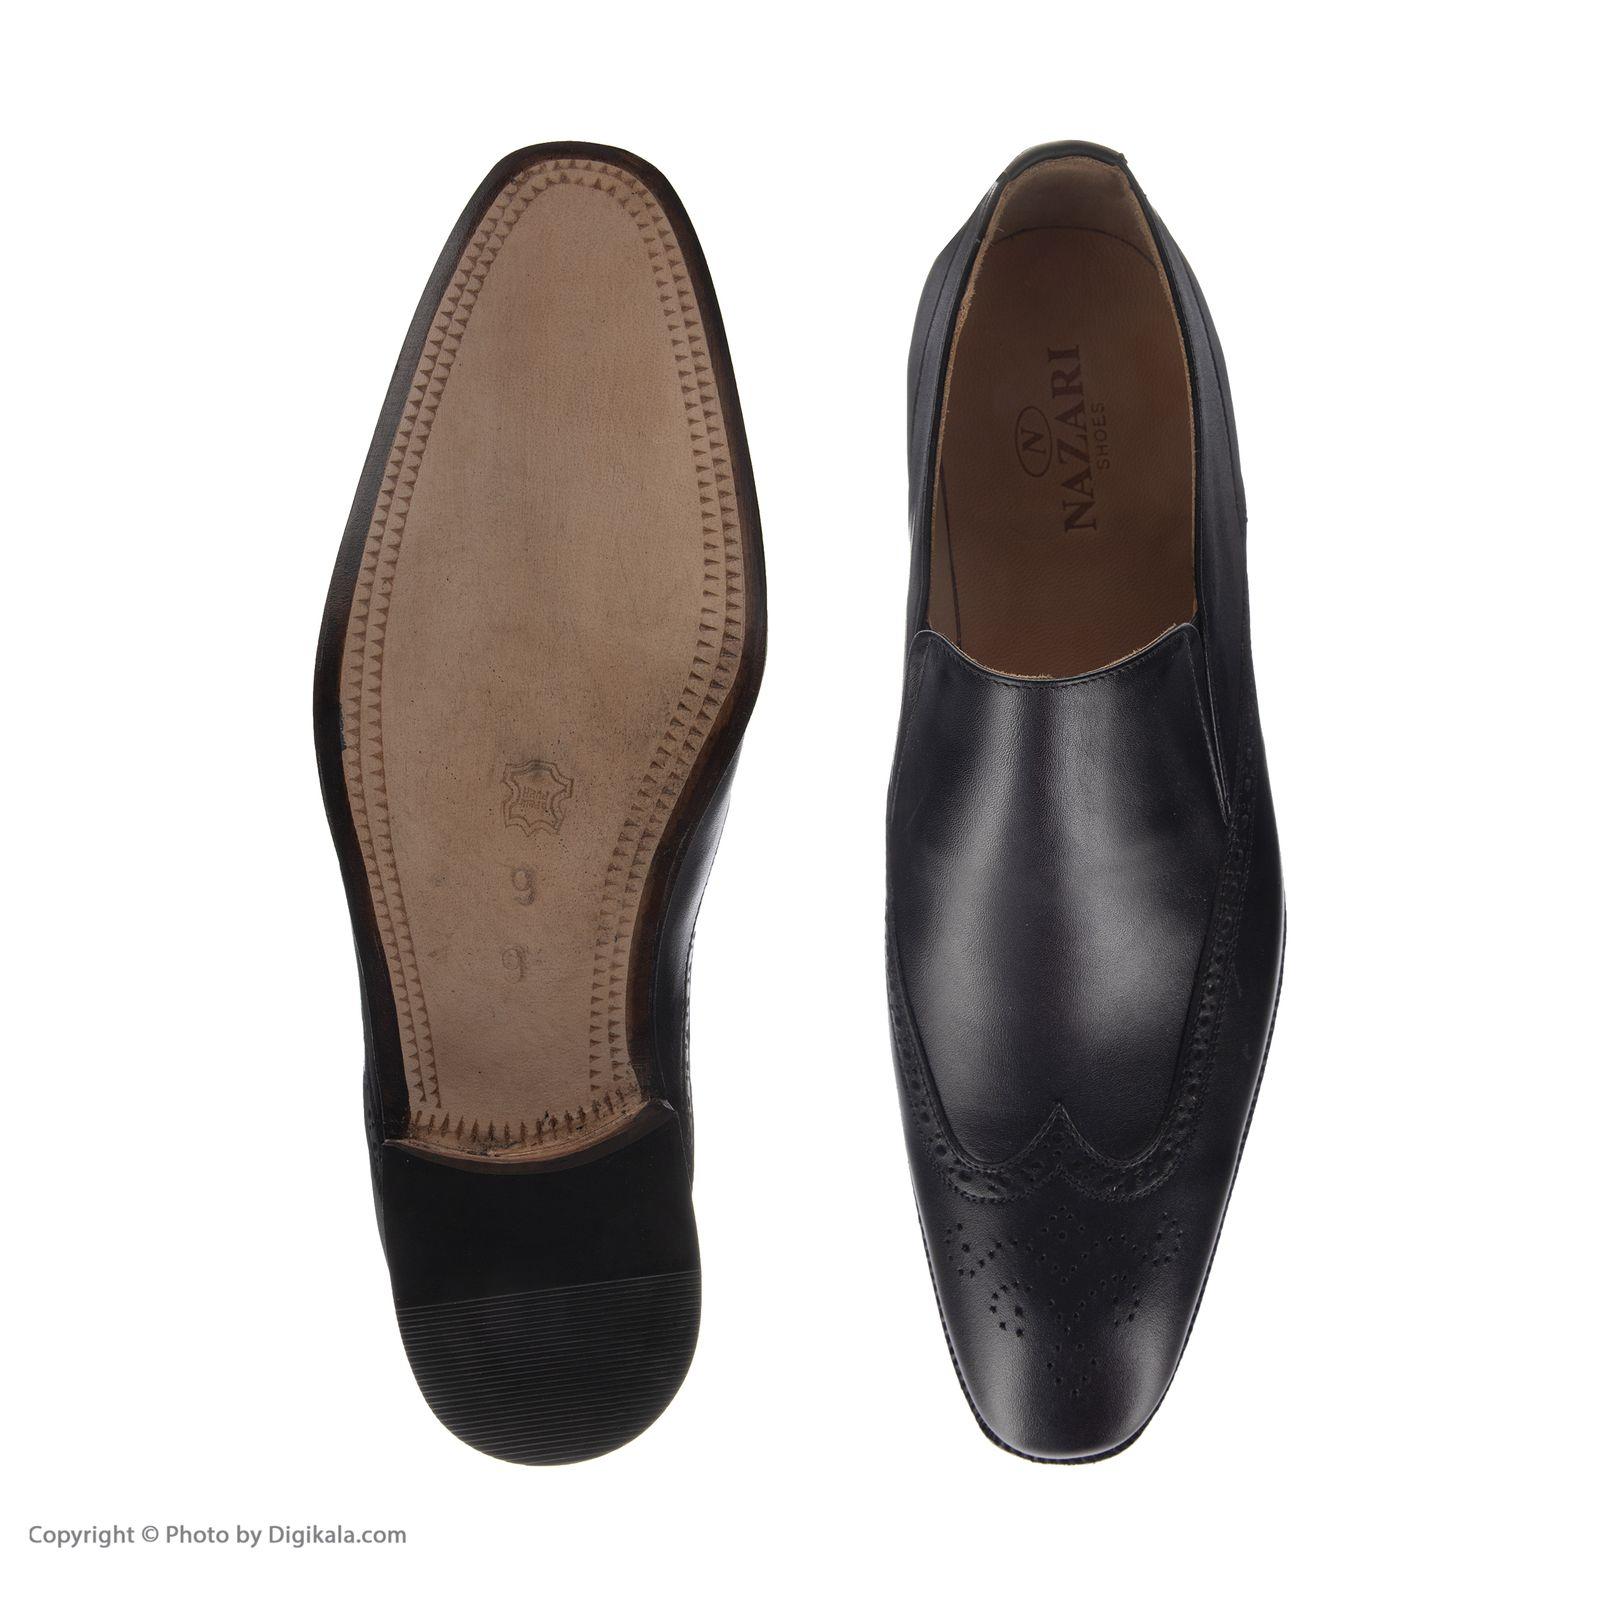 کفش مردانه نظری کد 435 -  - 5